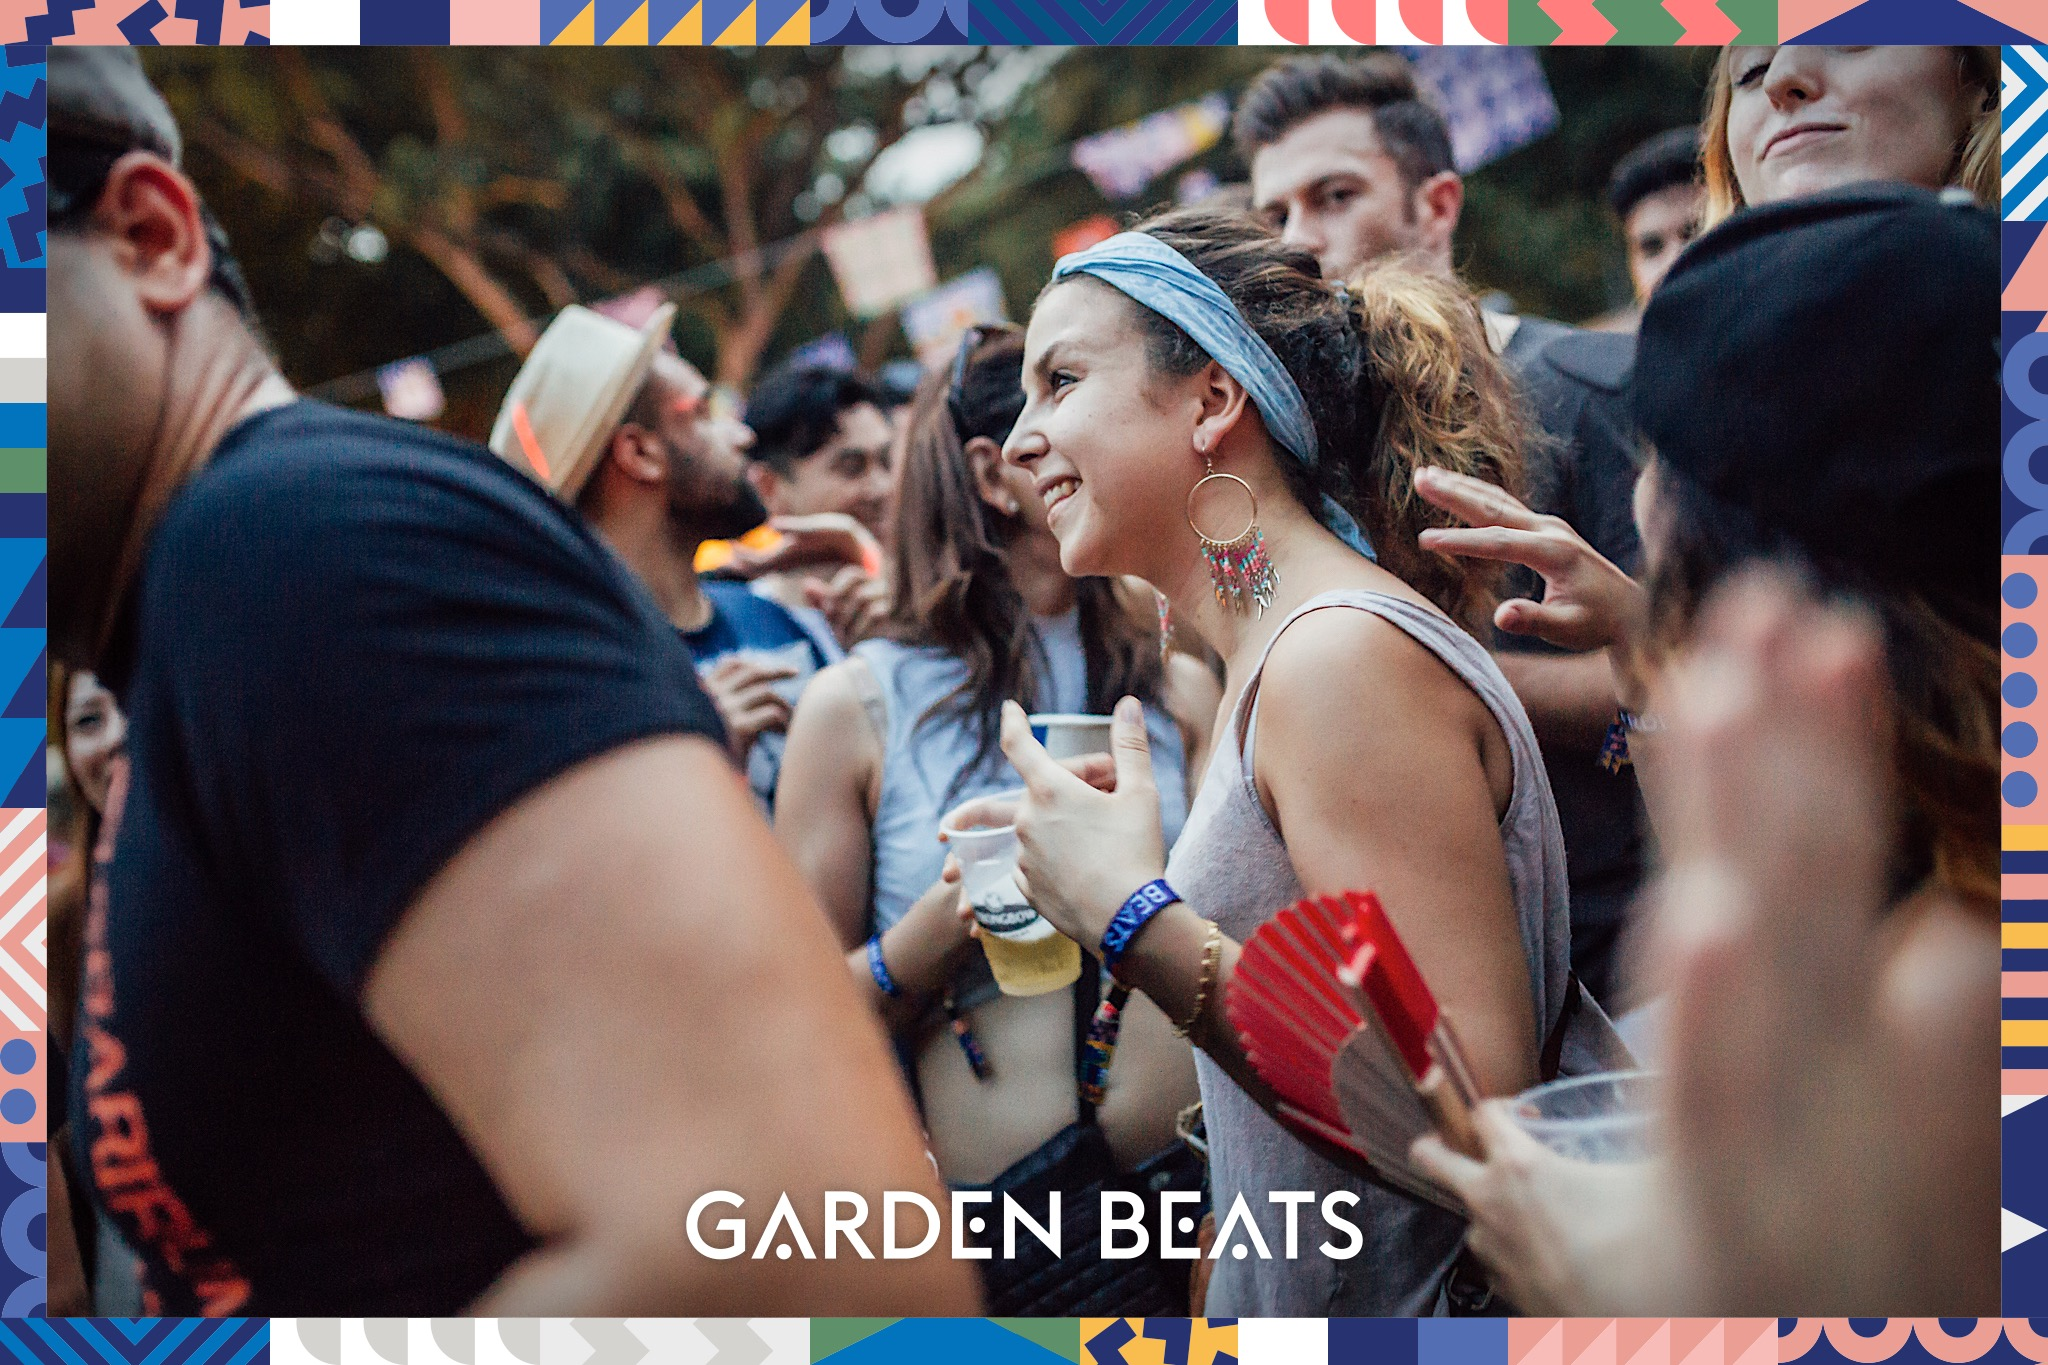 18032017_GardenBeats_Colossal721_WatermarkedGB.jpg